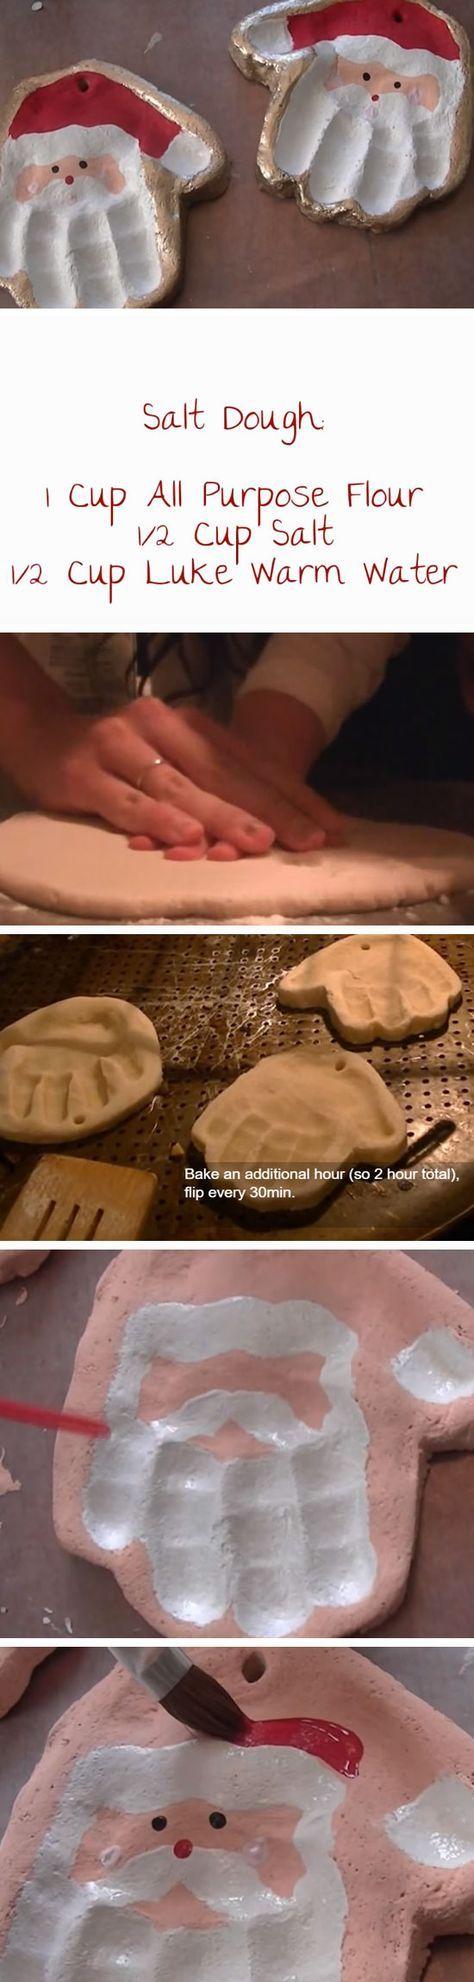 Salt Dough Santa Handprint | 20+ DIY Christmas Crafts for Kids to Make